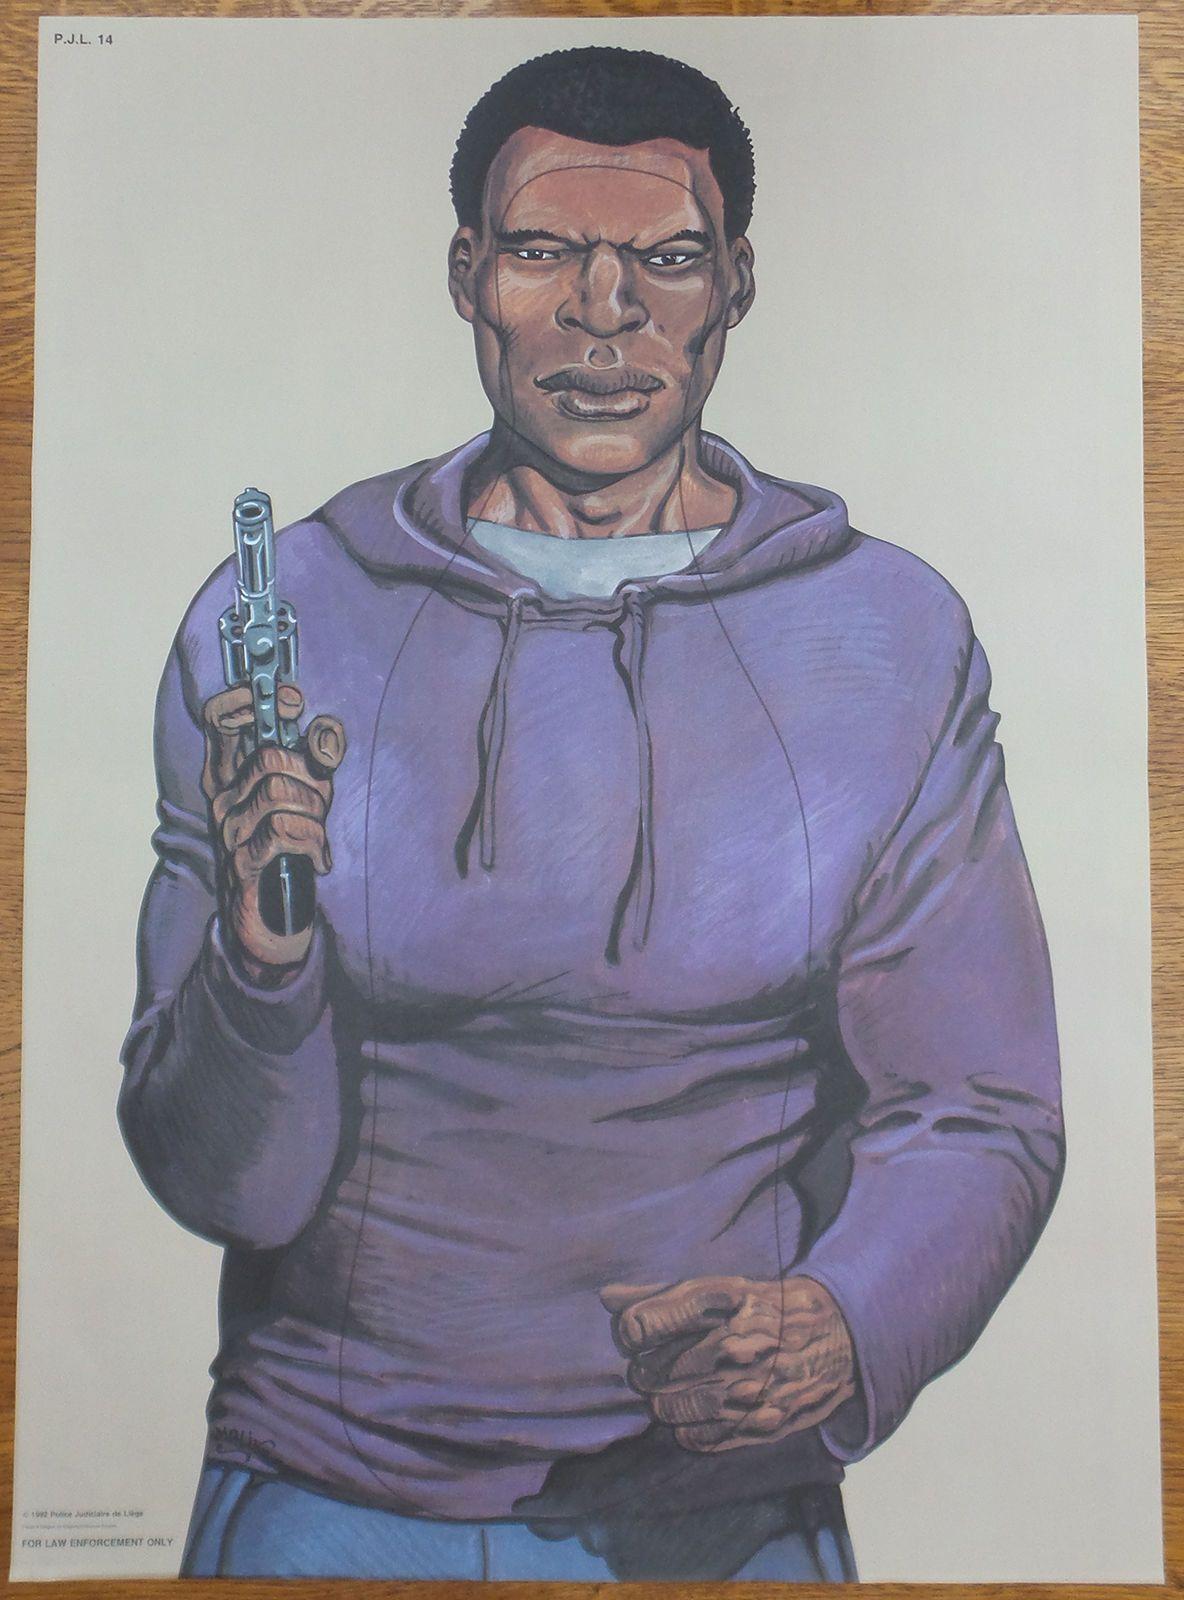 Vintage Police Law Enforcement Shooting Target Poster as seen on Drew Pritchard